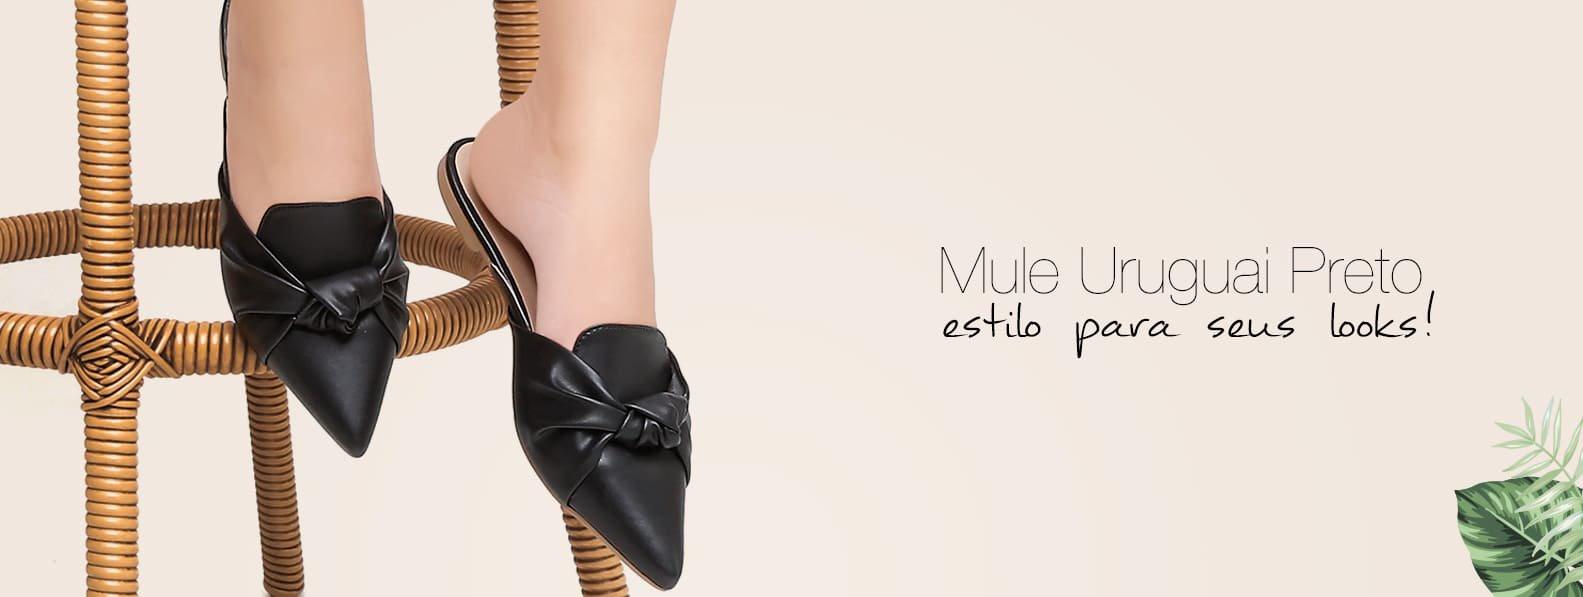 Mule Preto - Violanta Calçados